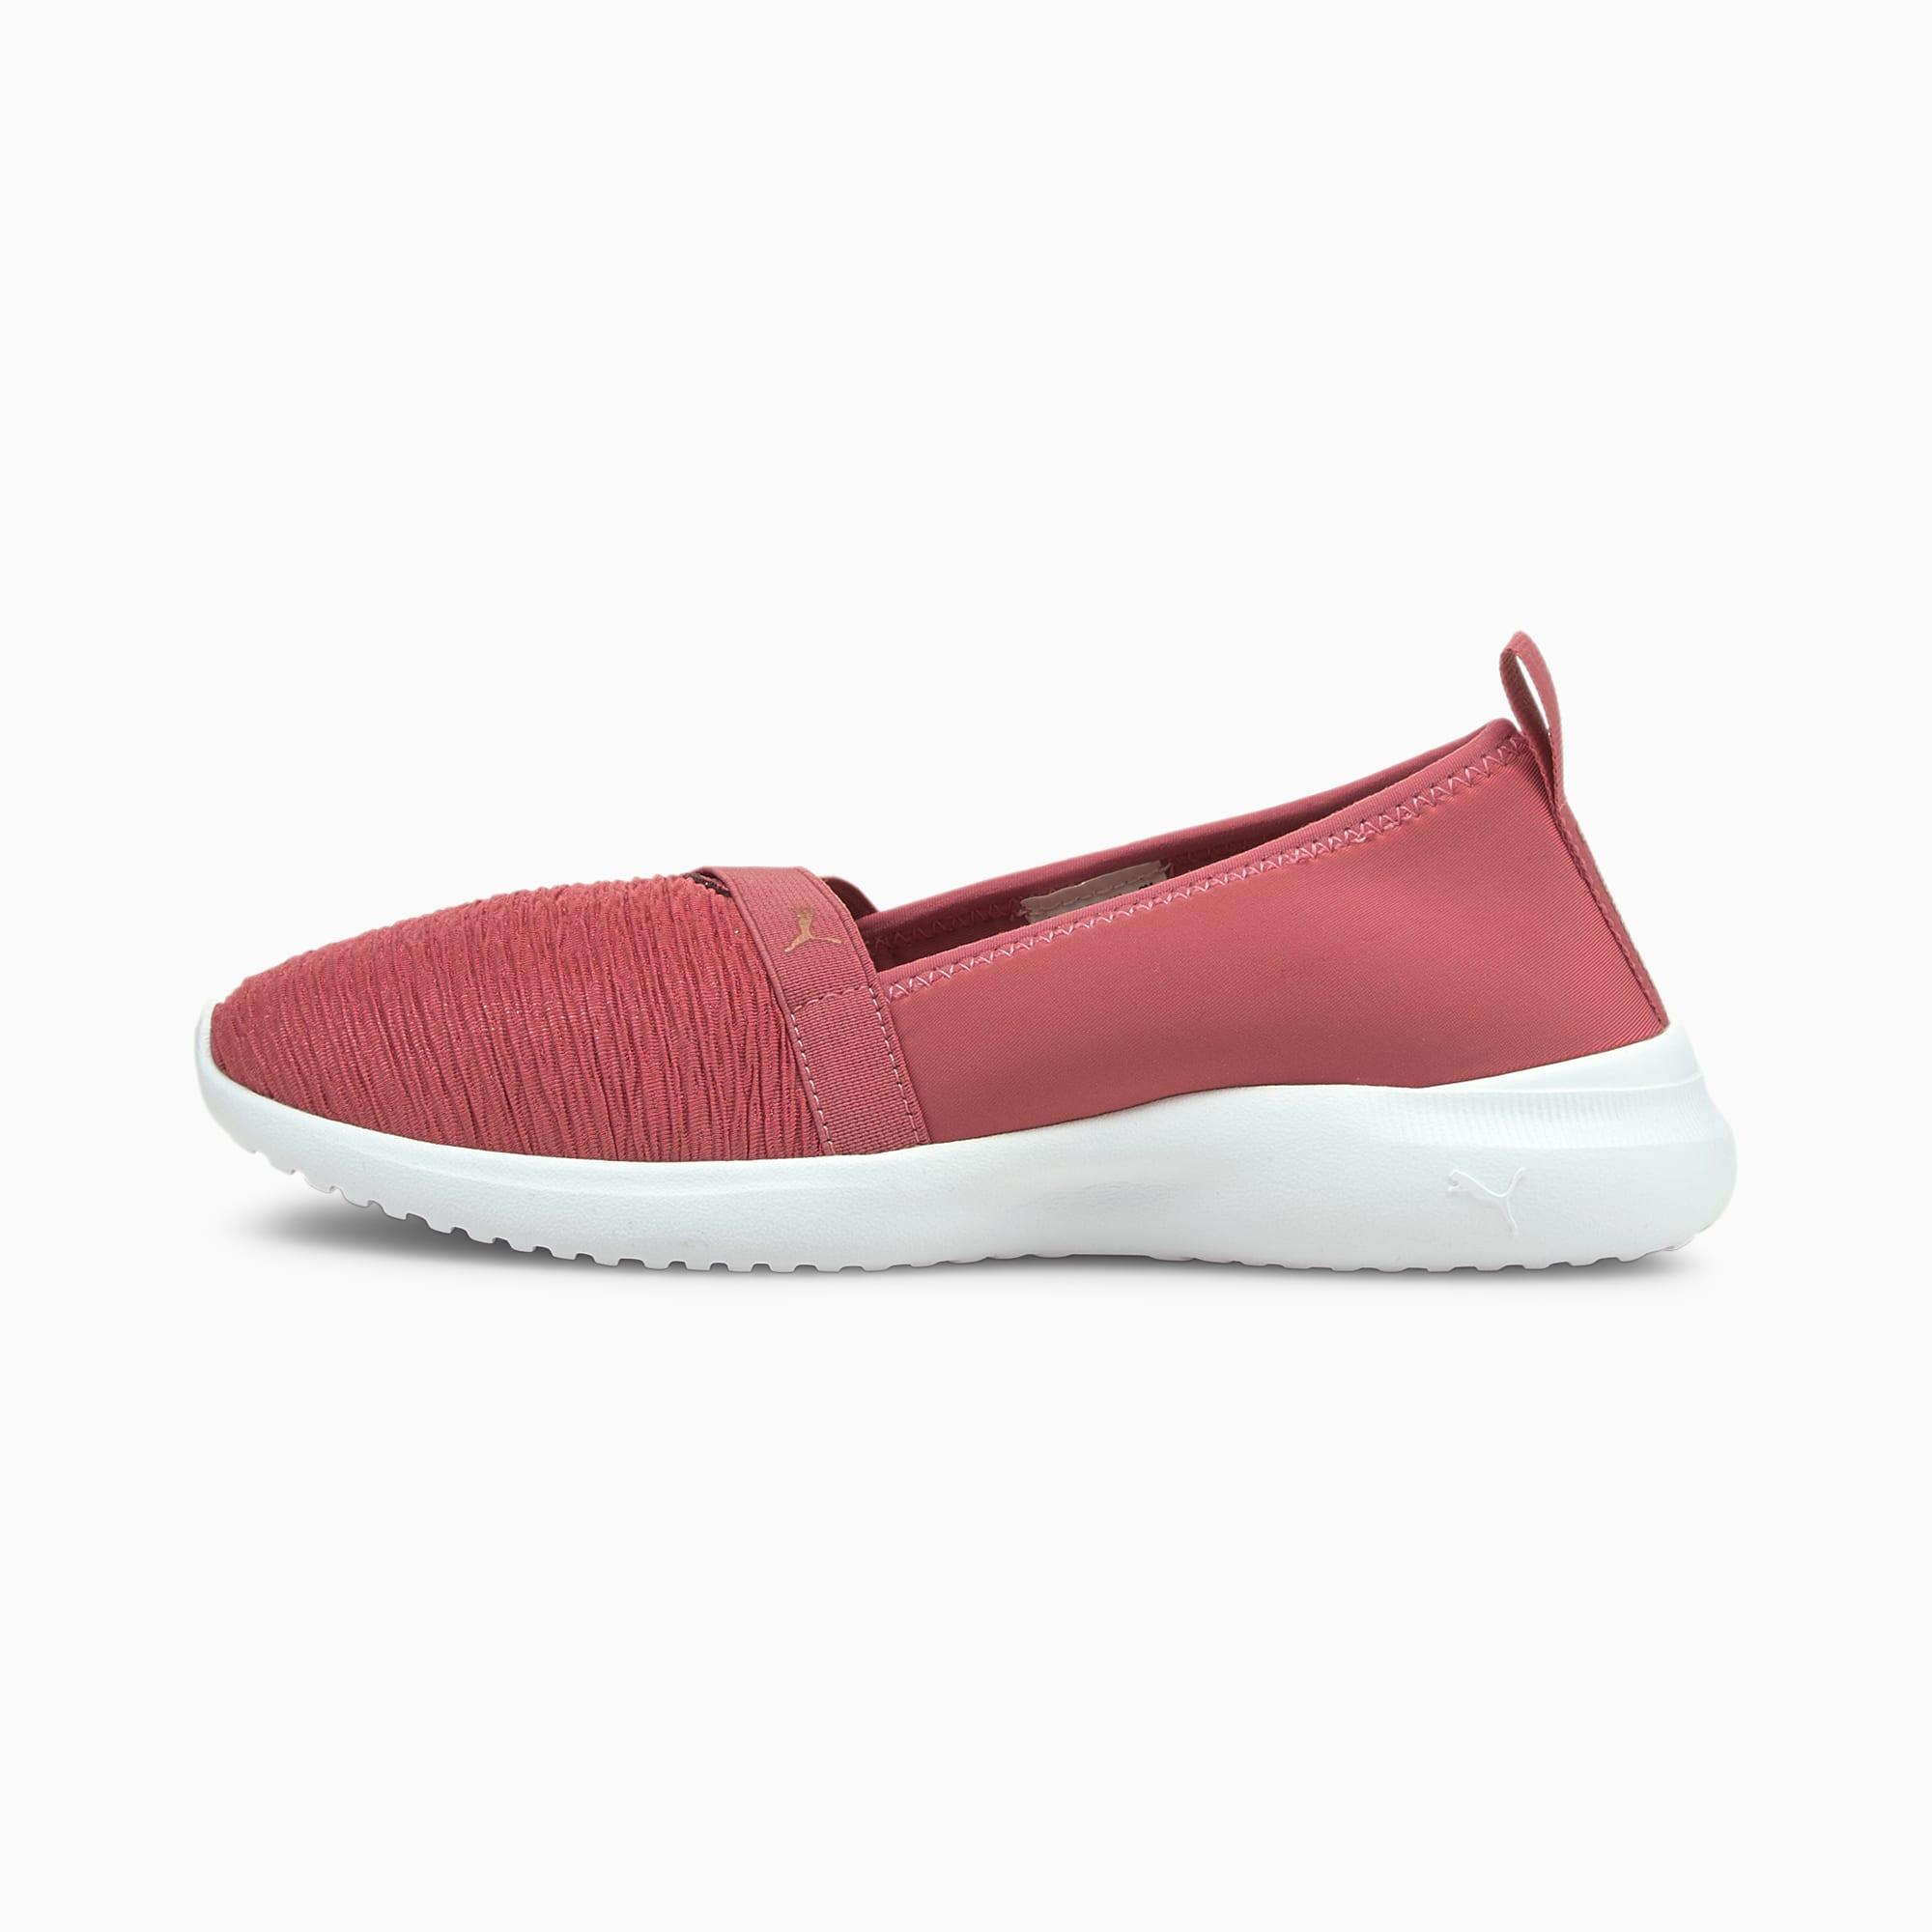 Adelina Women's Ballet Shoes